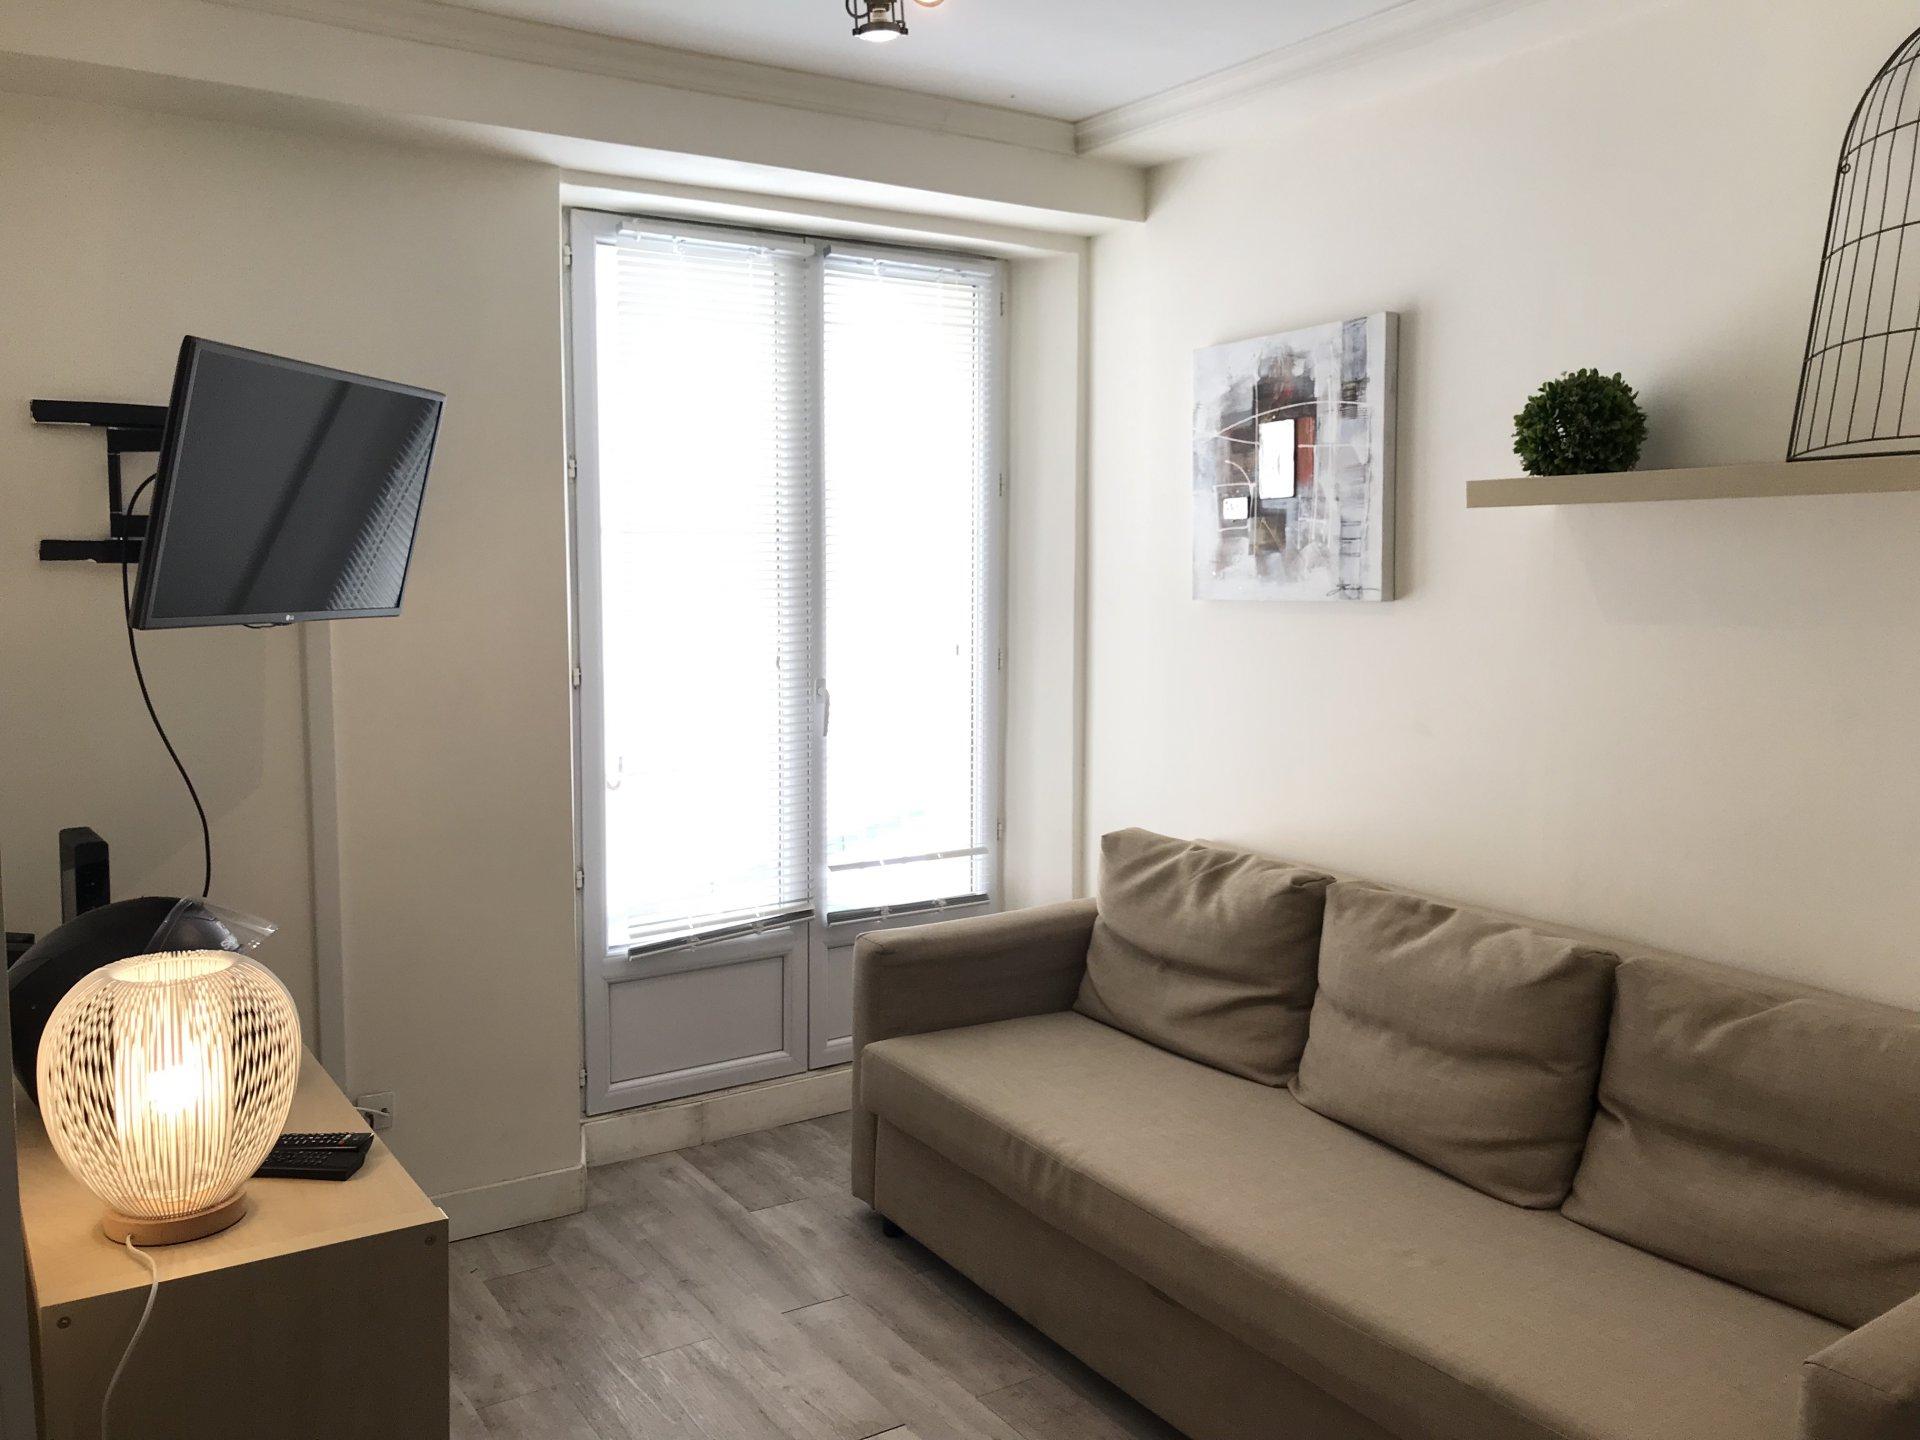 Location meublée annuelle - Studio rue Delille